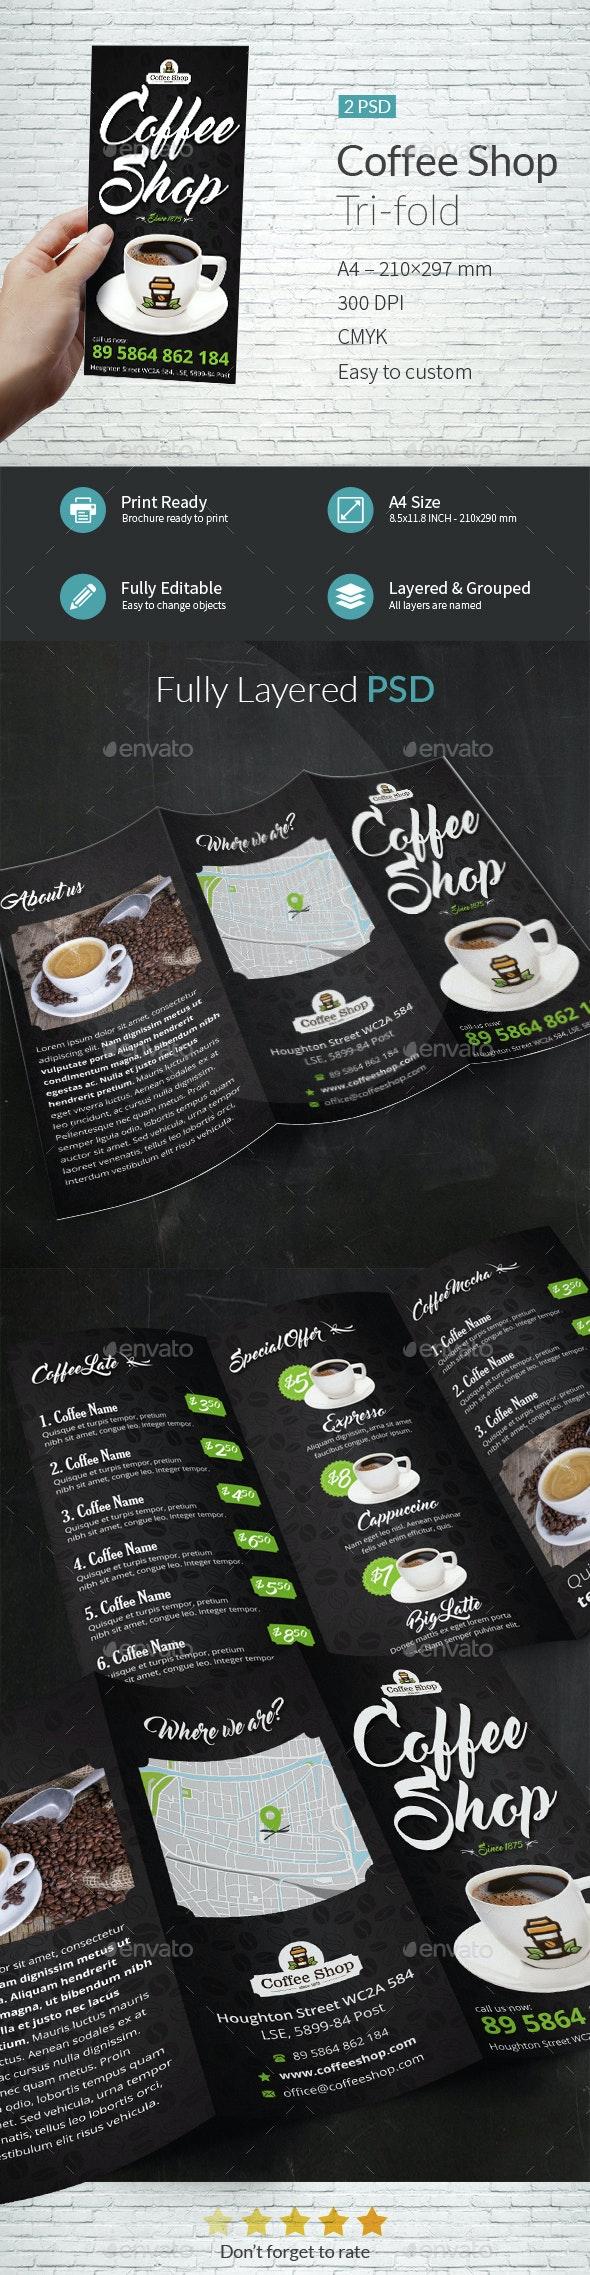 Coffee Shop Tri-fold Brochure Template - Brochures Print Templates